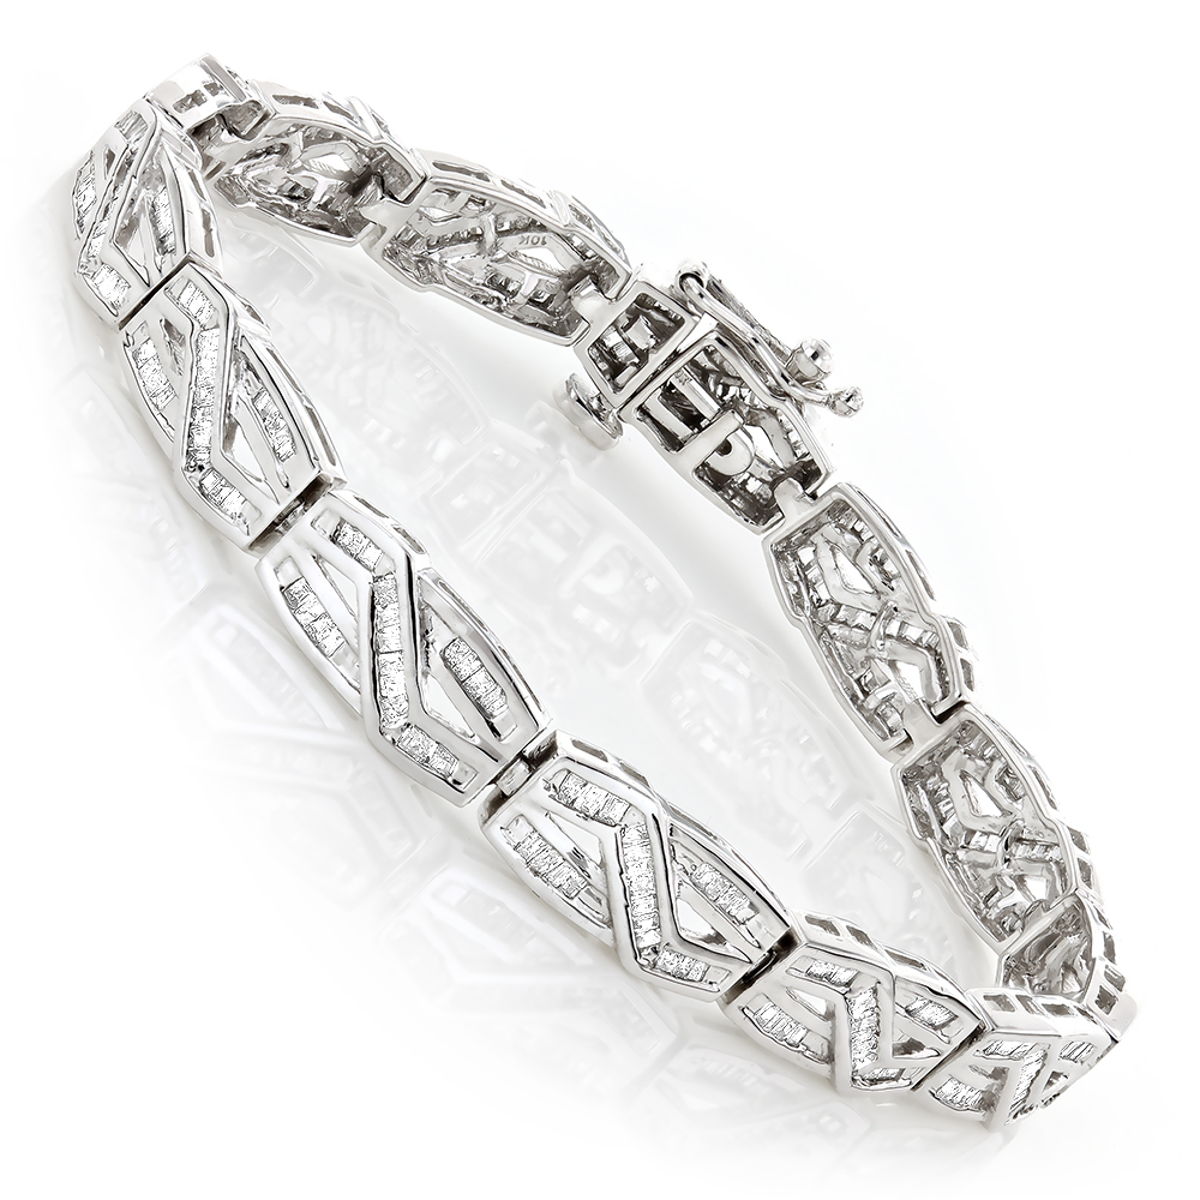 Womens Infinity Baguette Diamond Bracelet 2.84ct